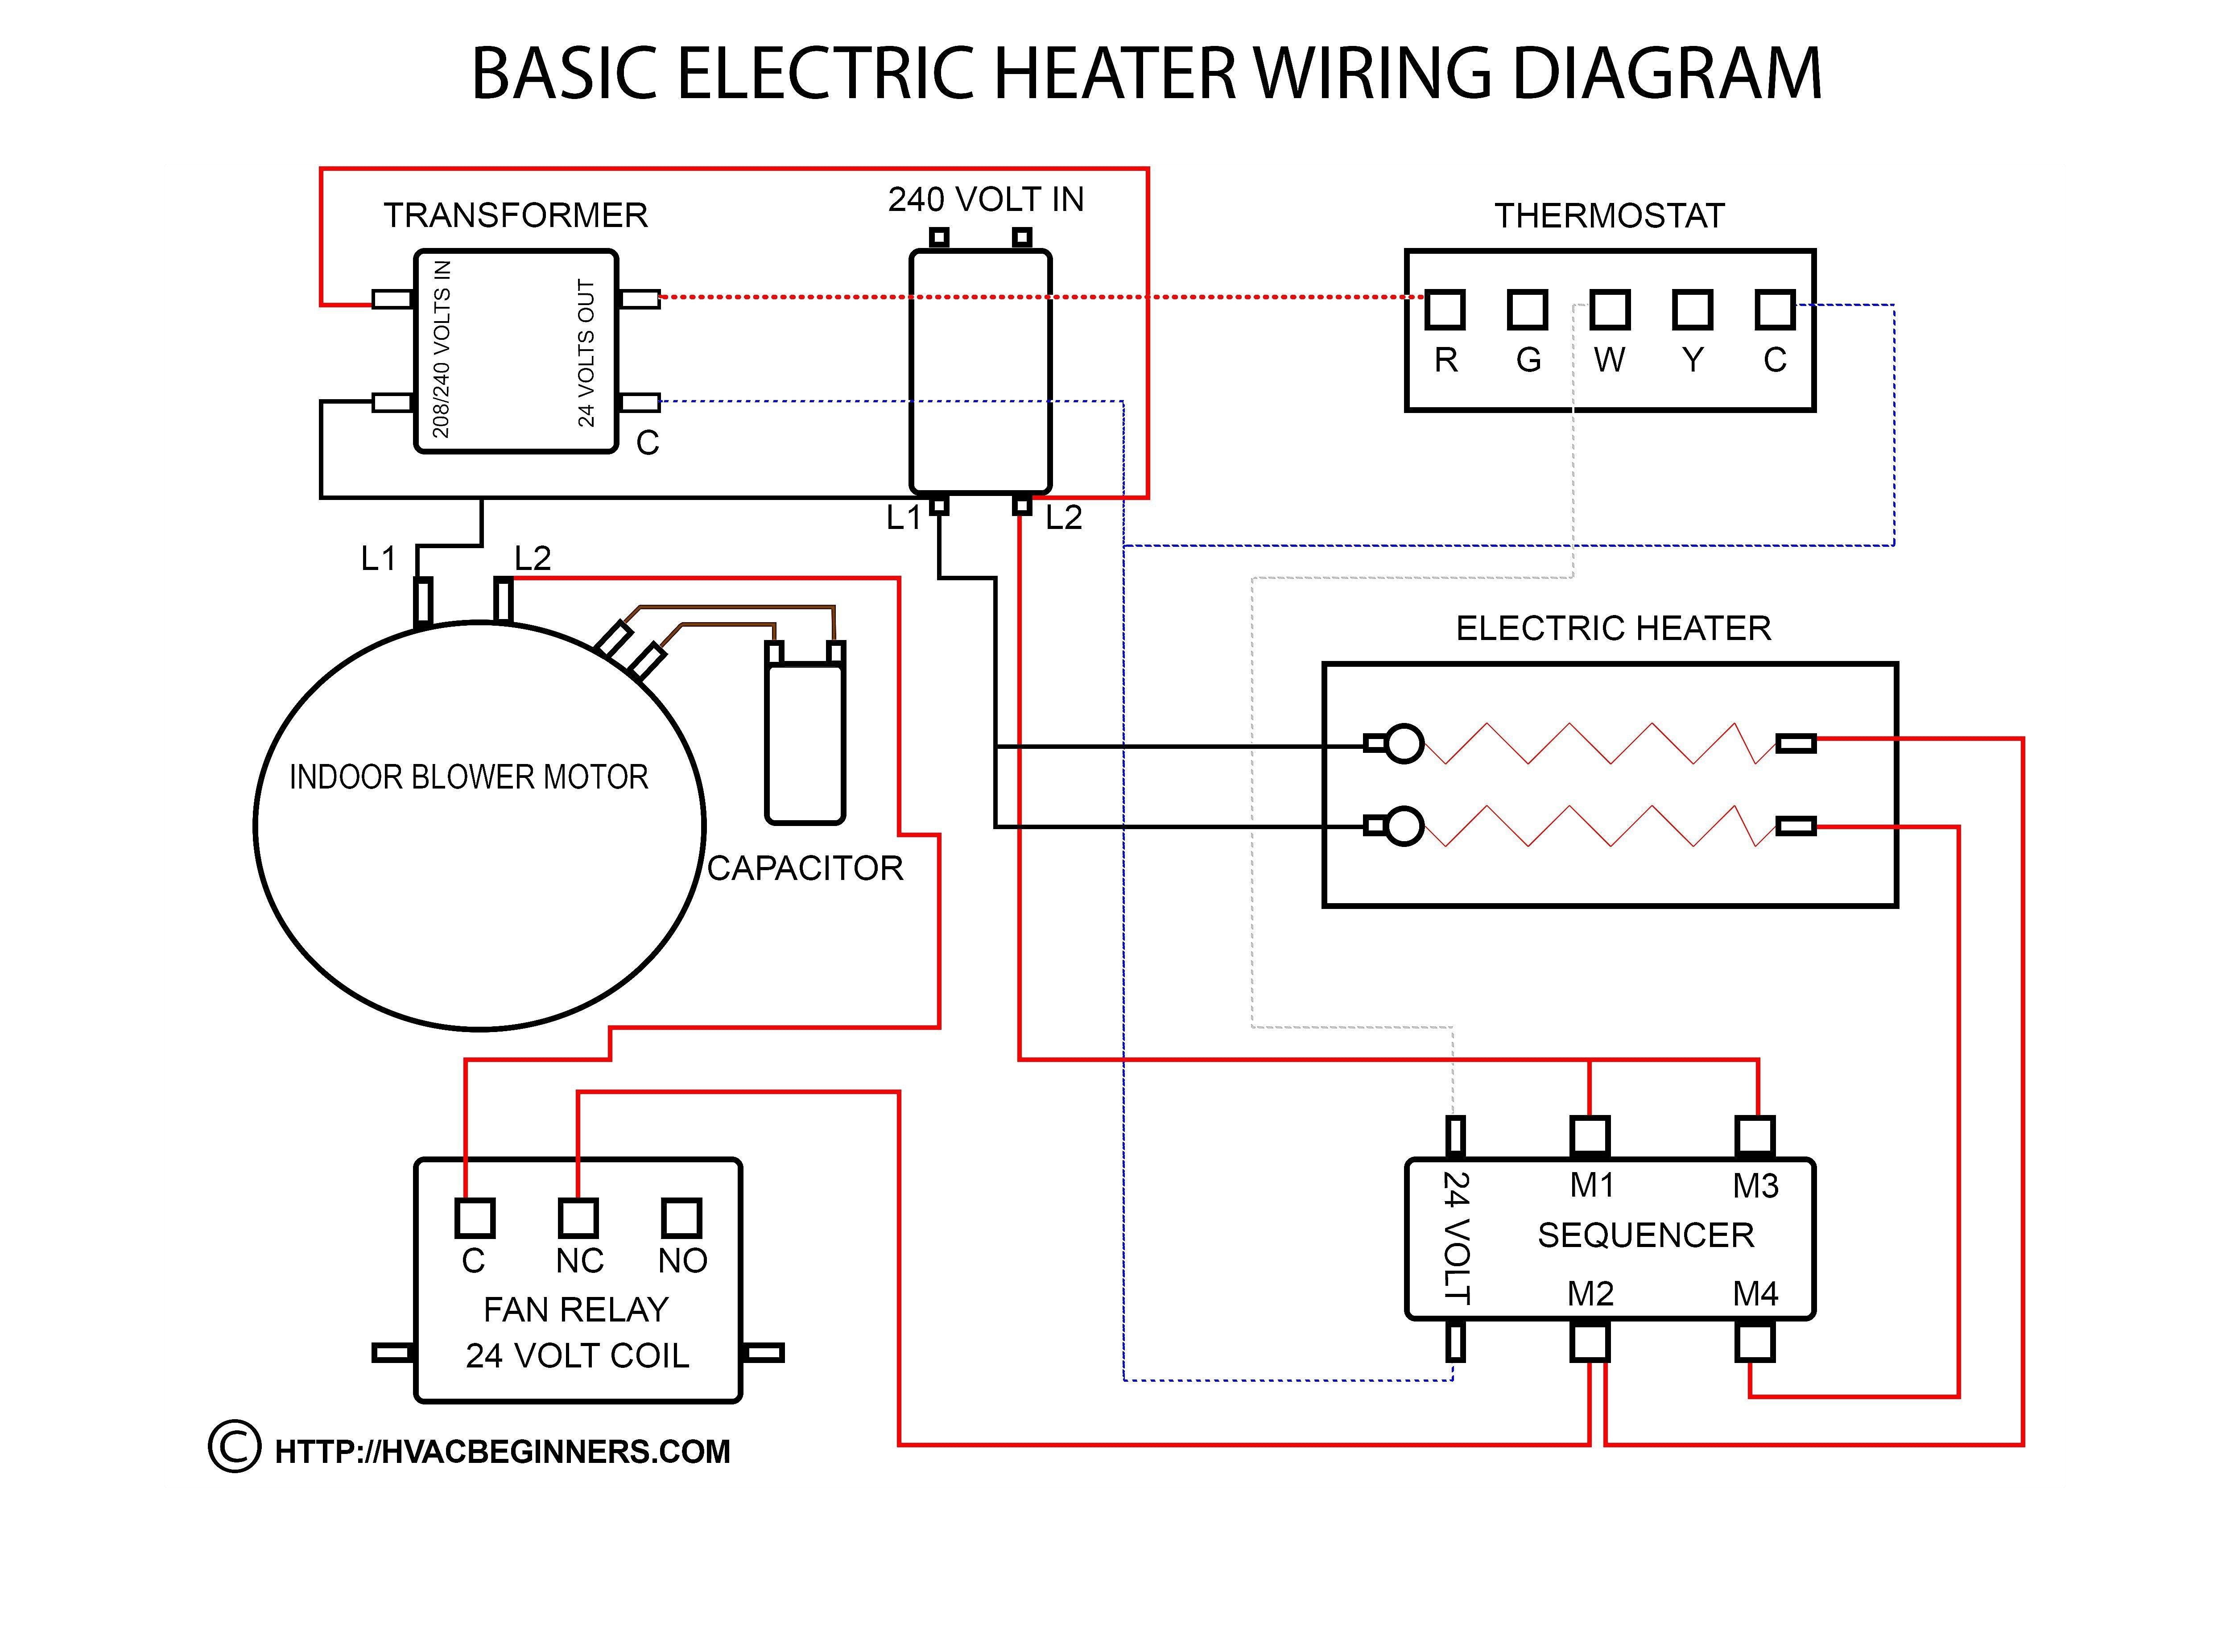 New Wiring Diagram For Ac To Furnace Aplicaciones Para Educacion